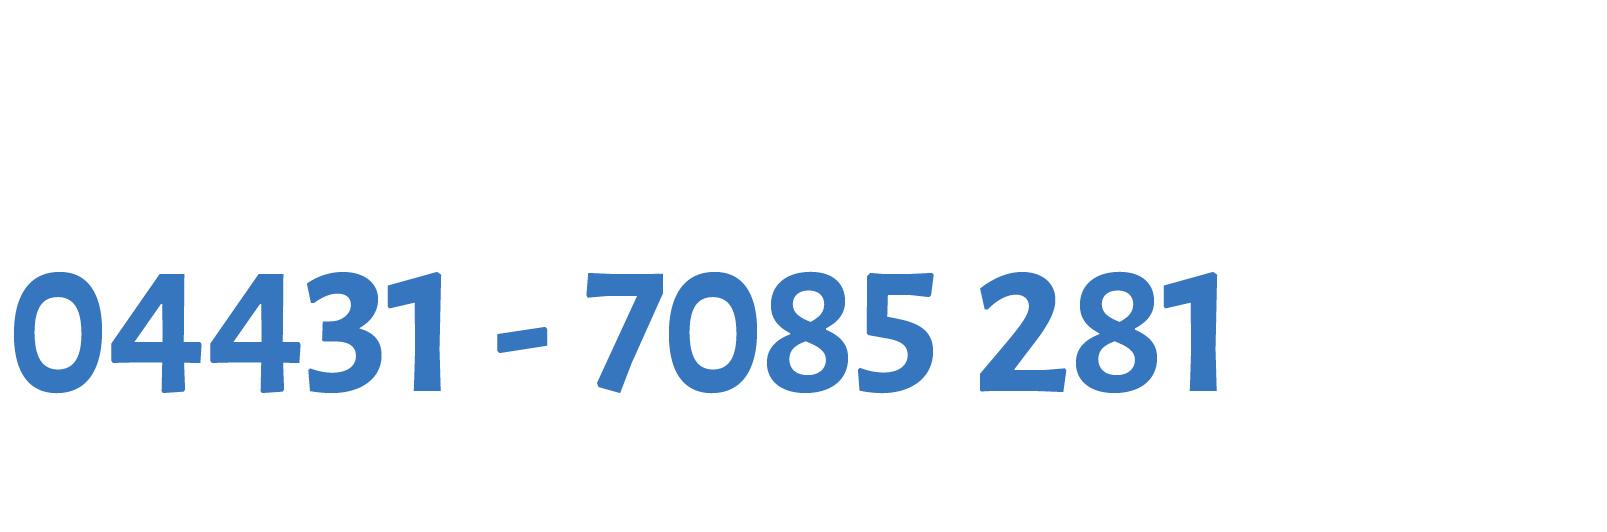 Musikschule Landkreis Oldenburg gGmbH Logo